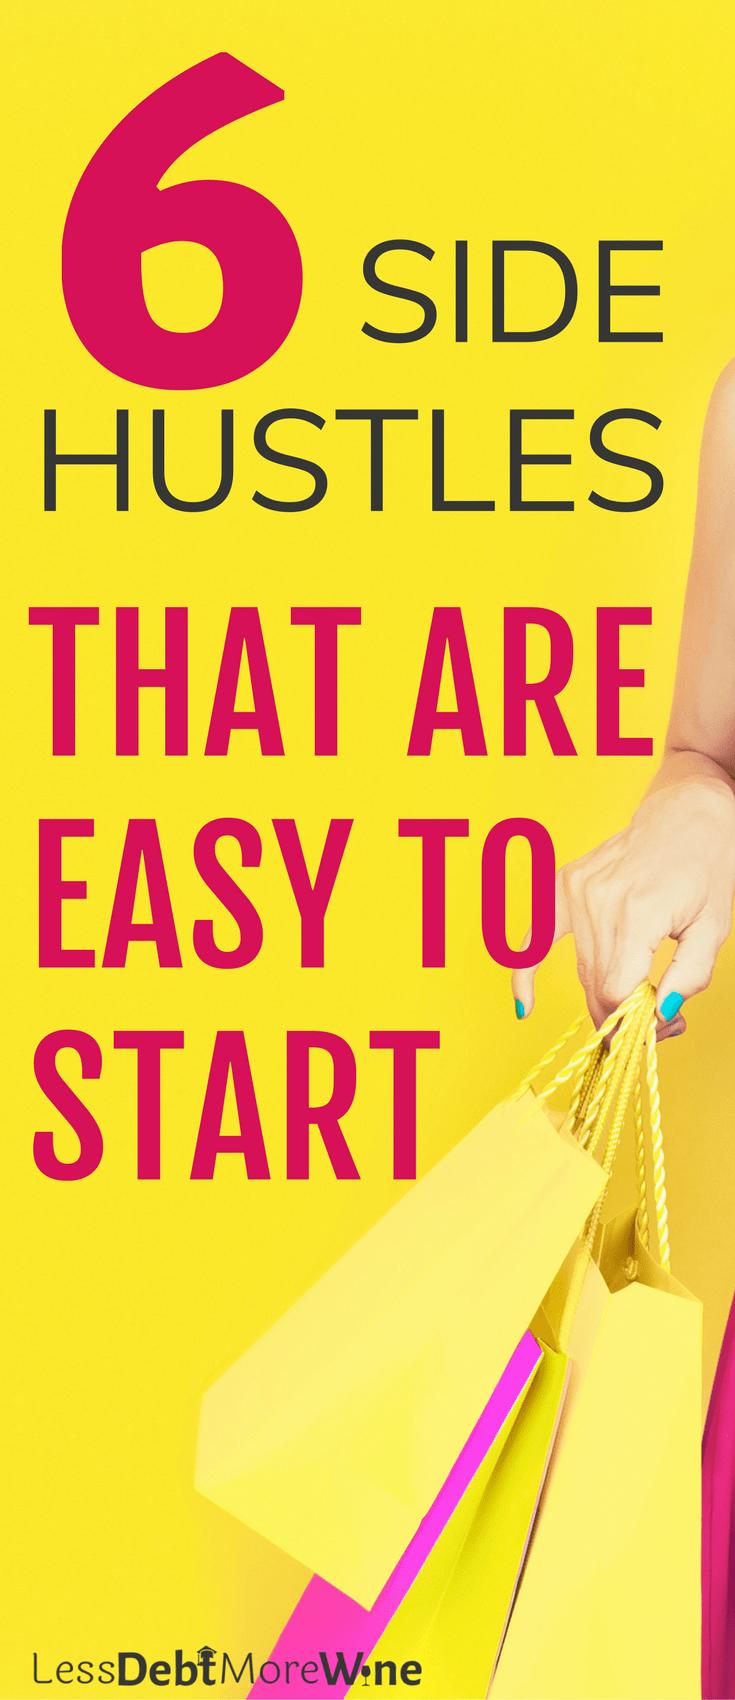 side hustle | earn more money | make extra cash